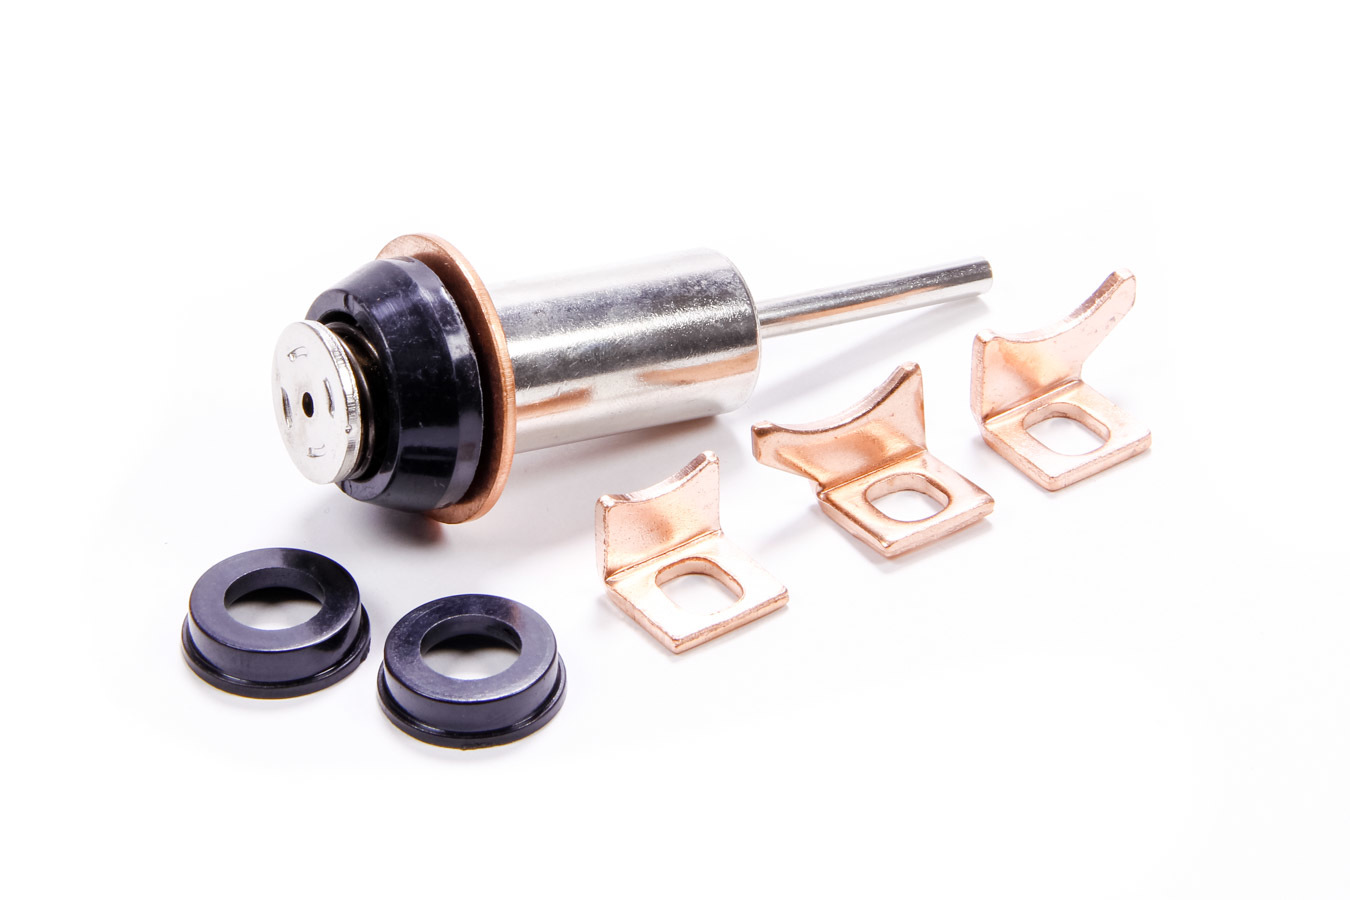 Powermaster XS Torque Starter Solenoid Repair Kit